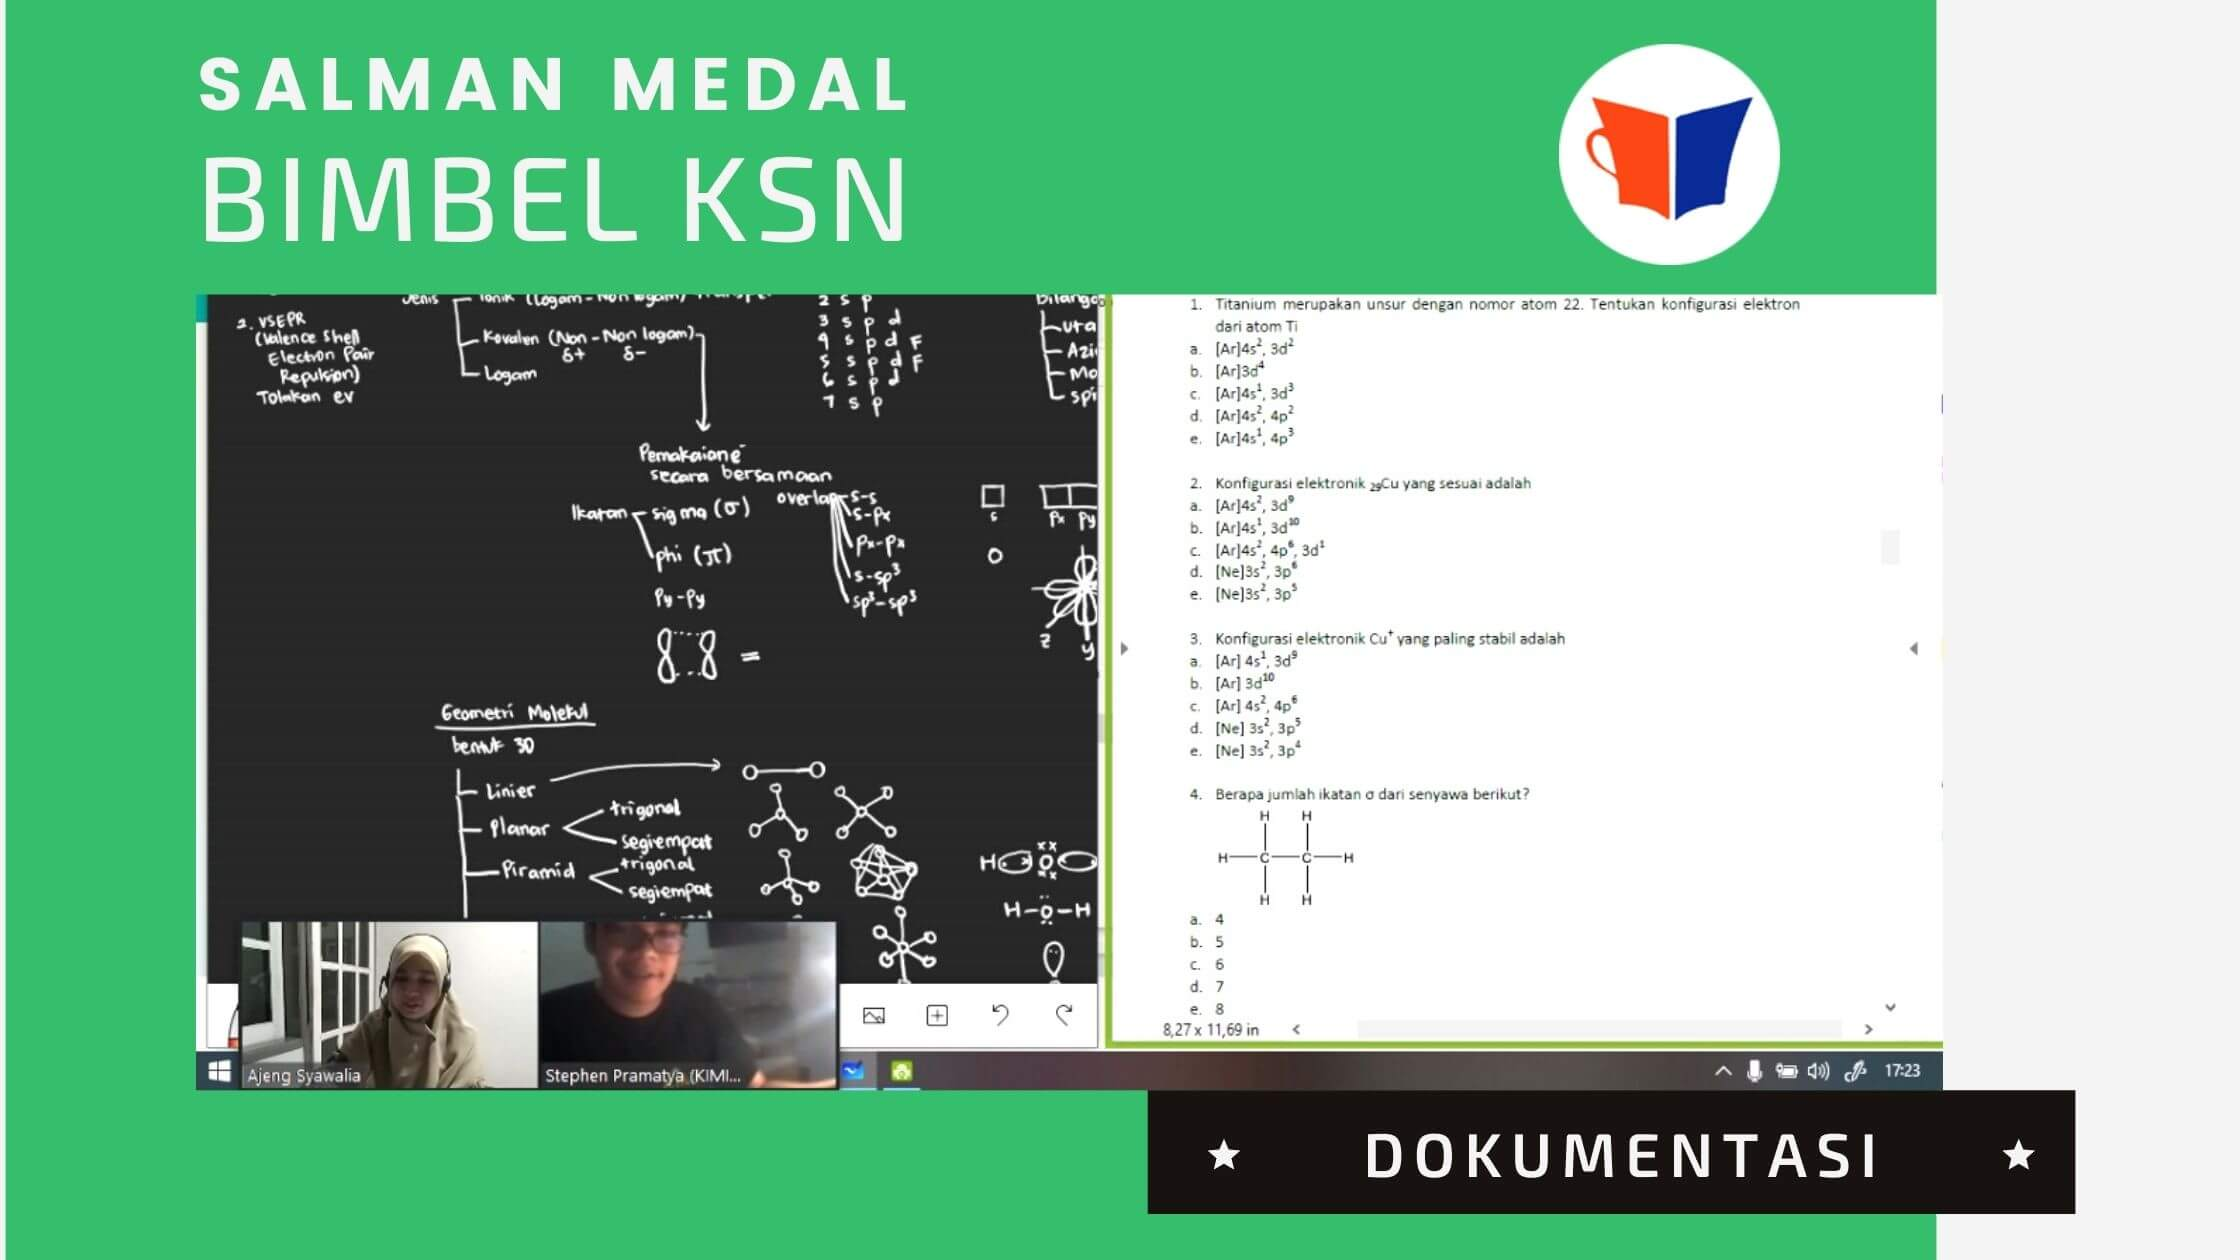 Dokumentasi Salman Medal Stephen